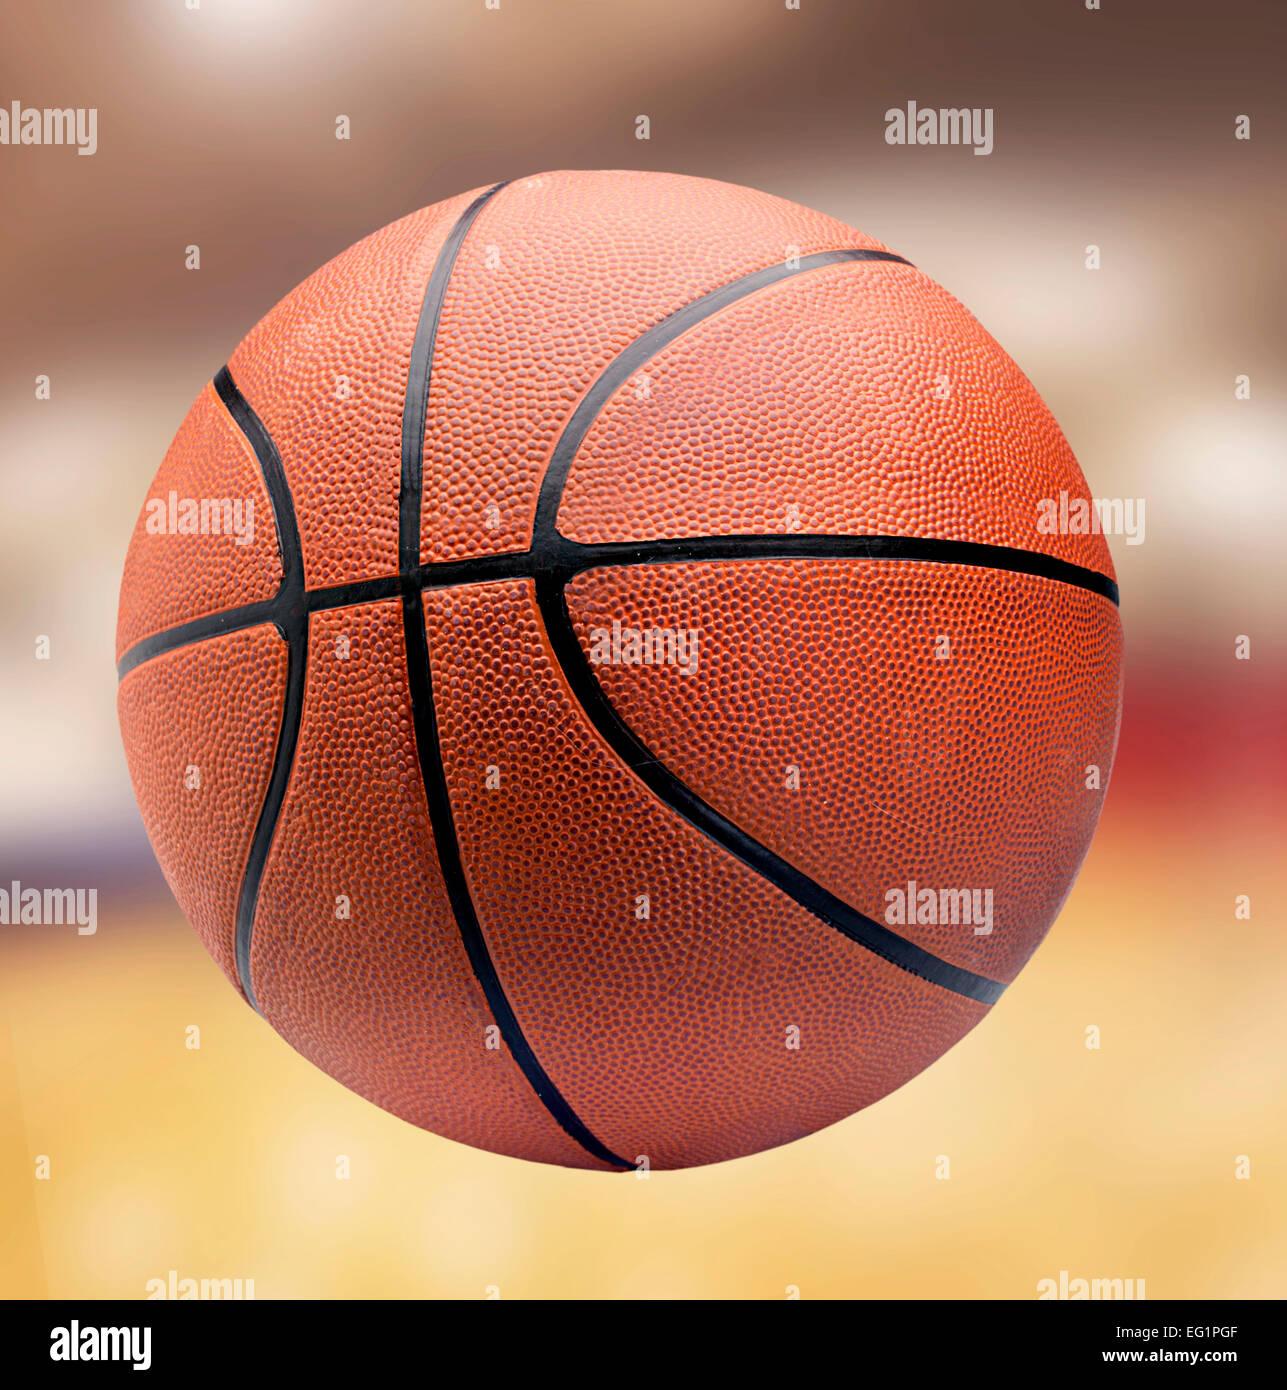 baloncesto Imagen De Stock